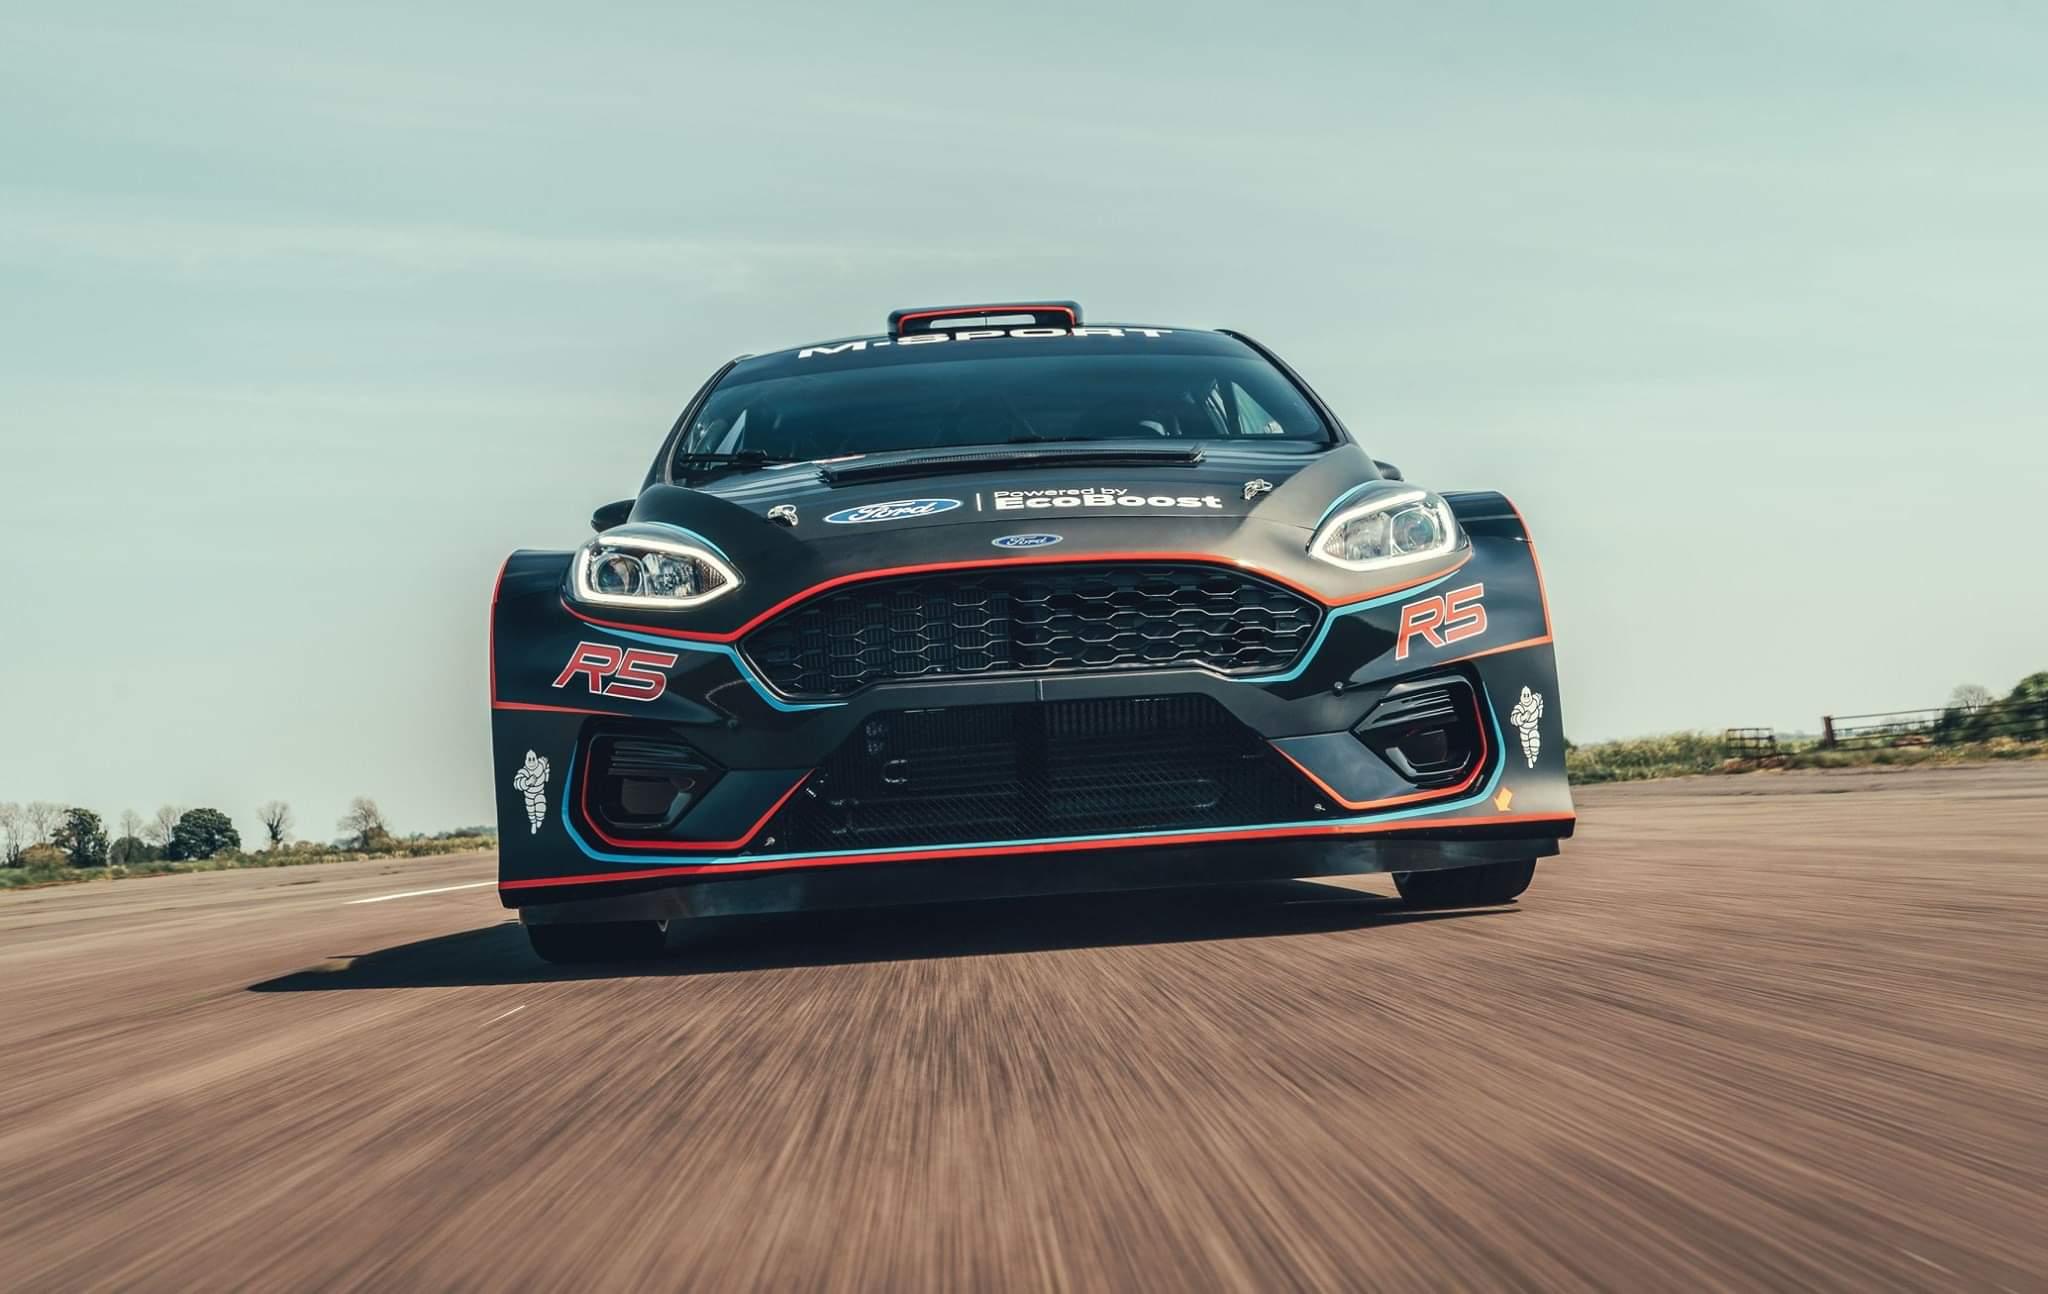 World Rally Championship: Temporada 2019 - Página 25 D8dy_YOXYAAd-m2